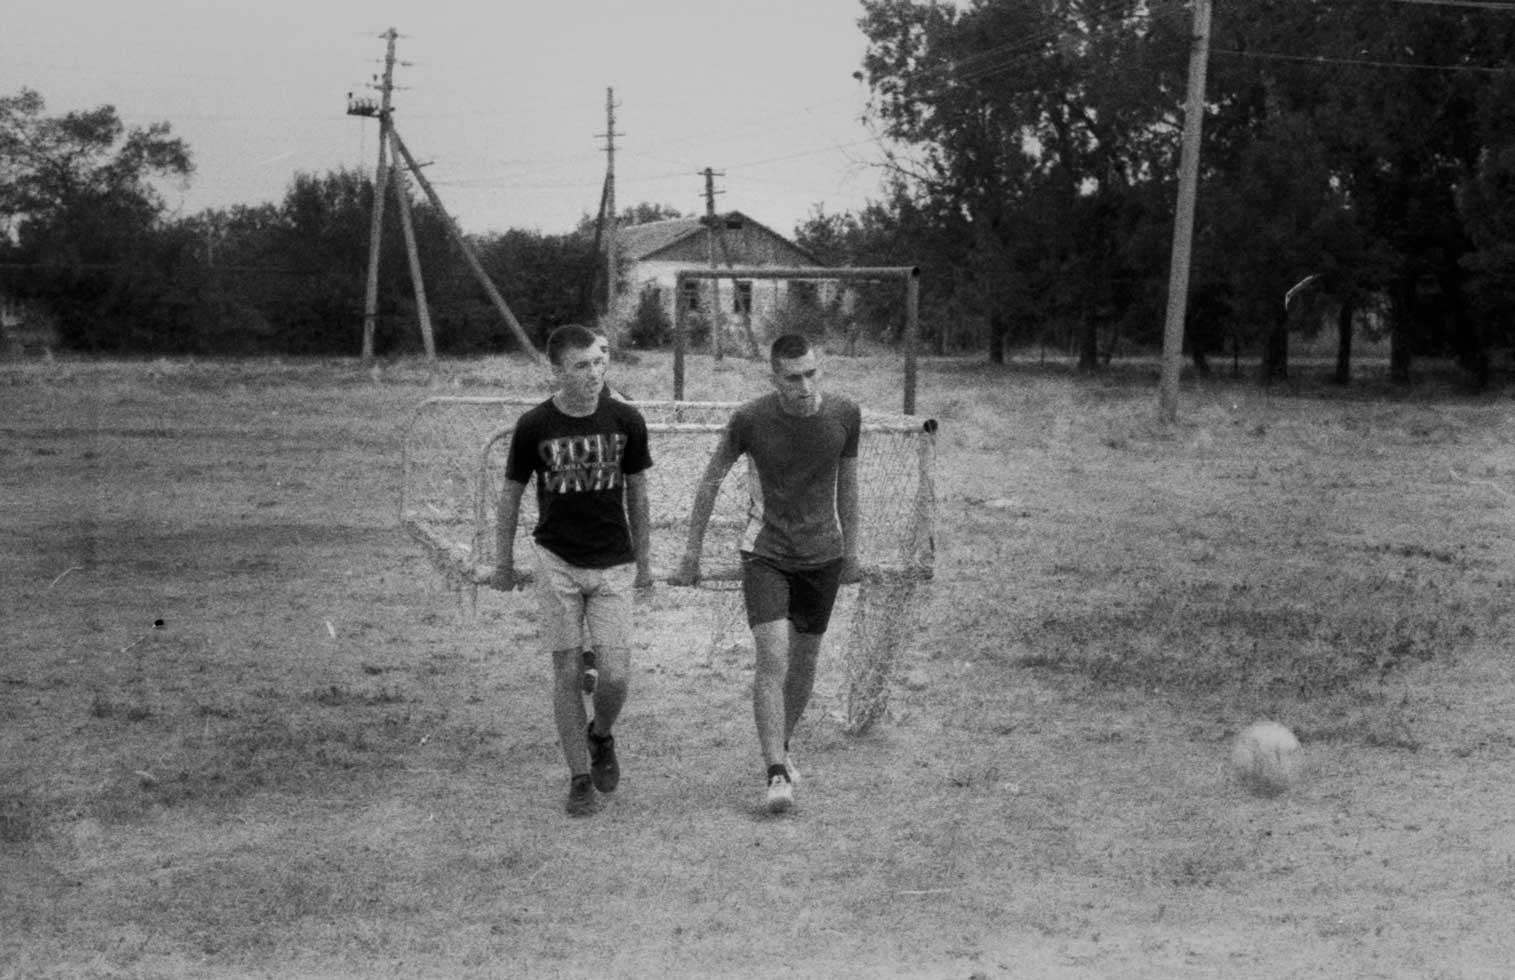 футбол в селе фотопленка